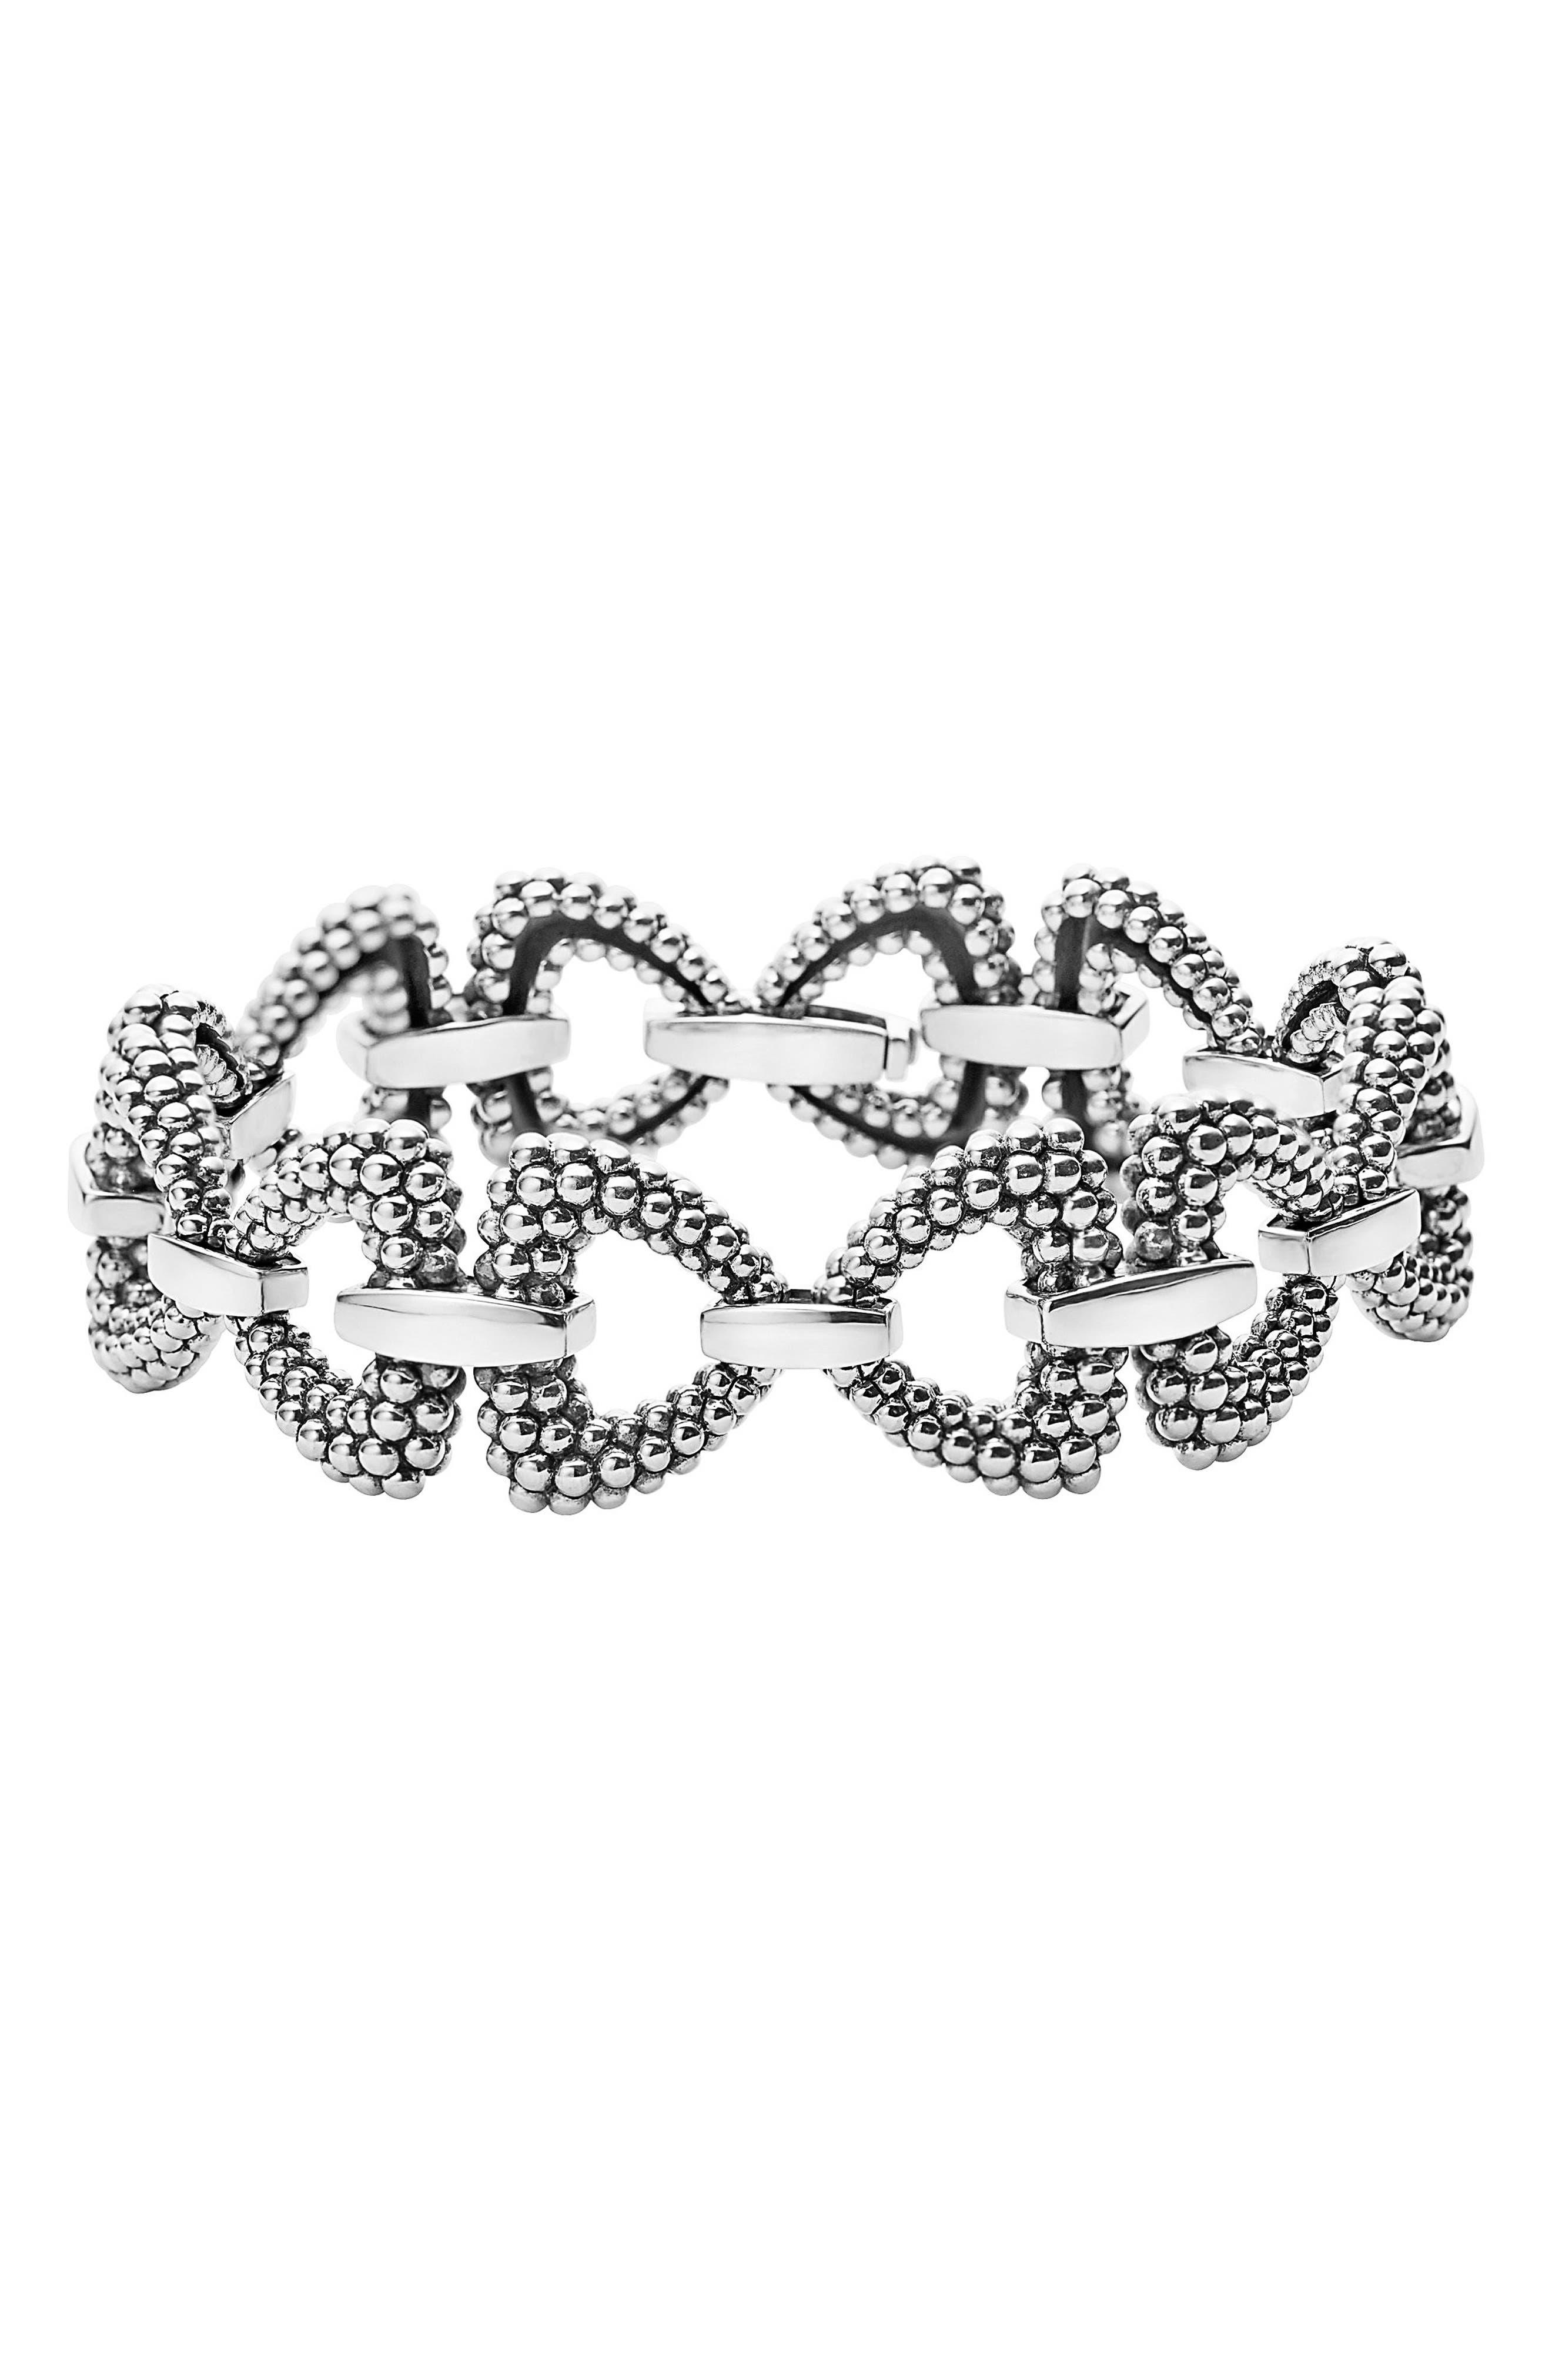 Derby Caviar Connector Link Bracelet,                             Main thumbnail 1, color,                             SILVER